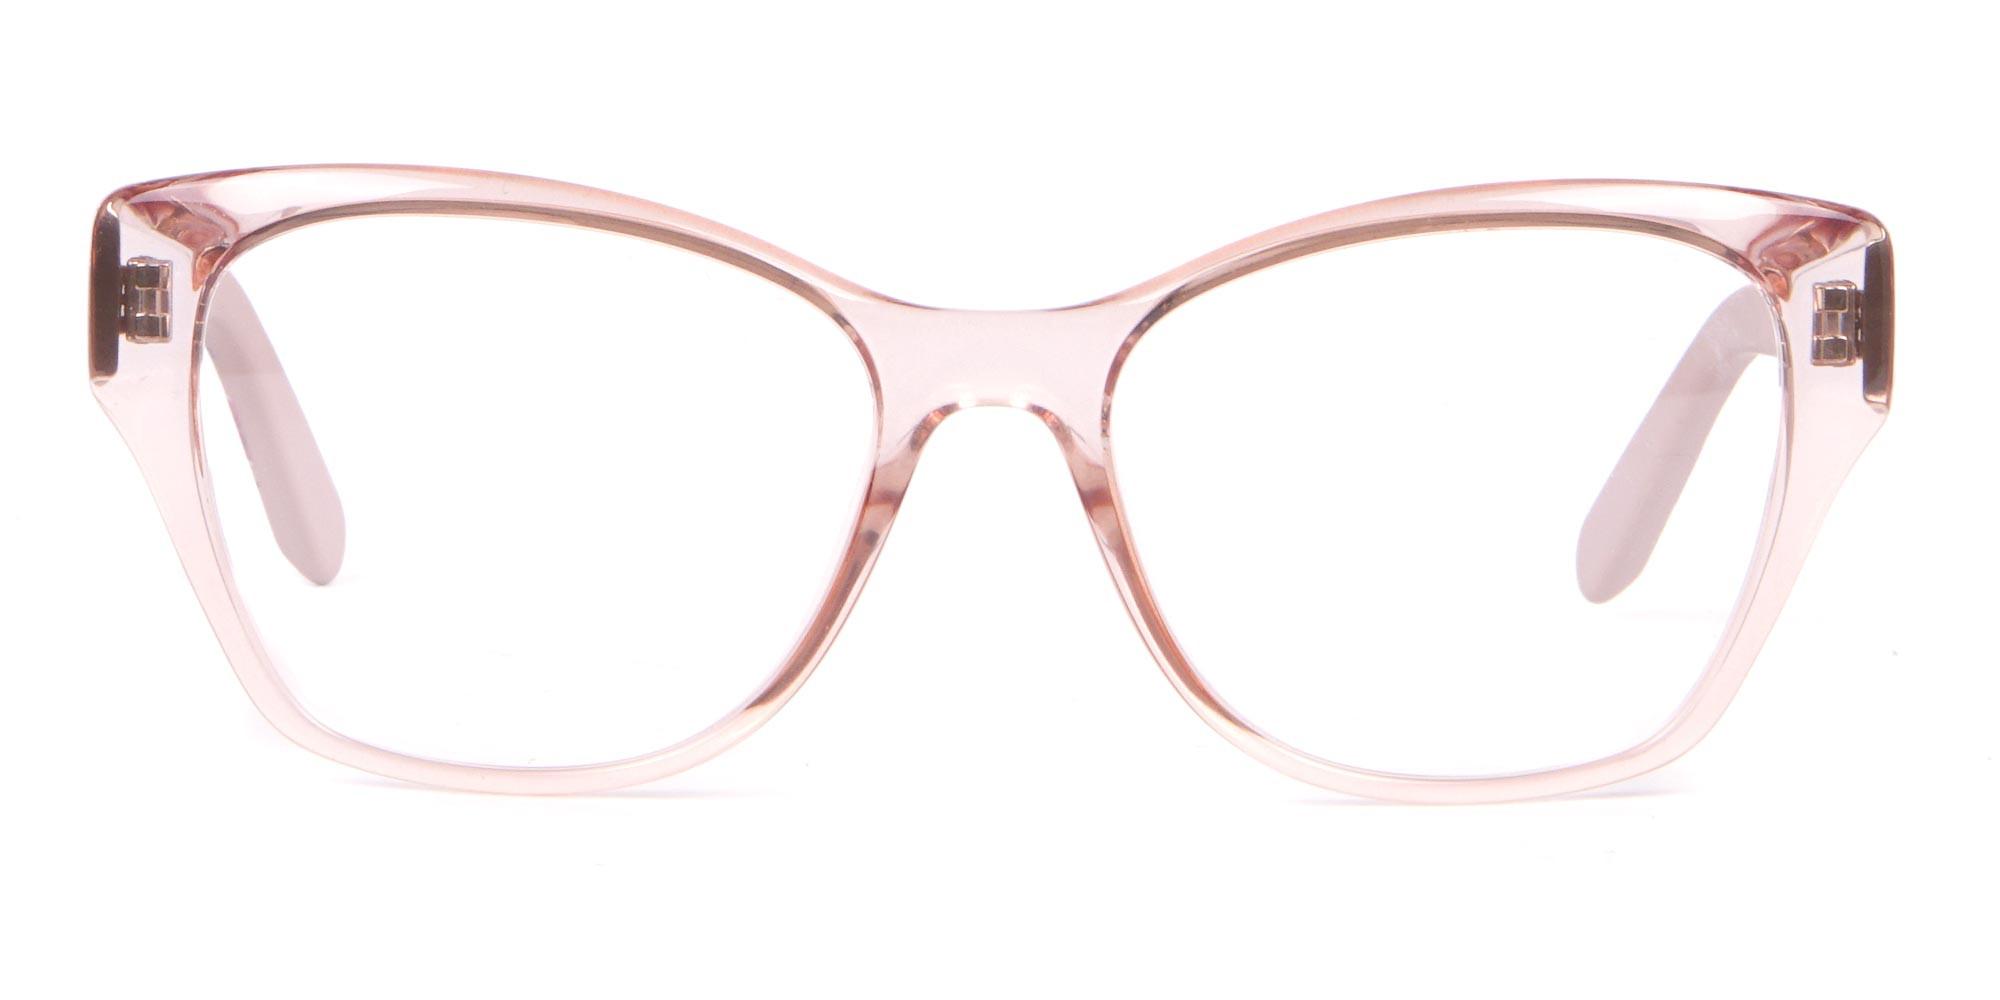 Salvatore Ferragamo SF2827 Cateye Wayfarer Glasses Nude-1